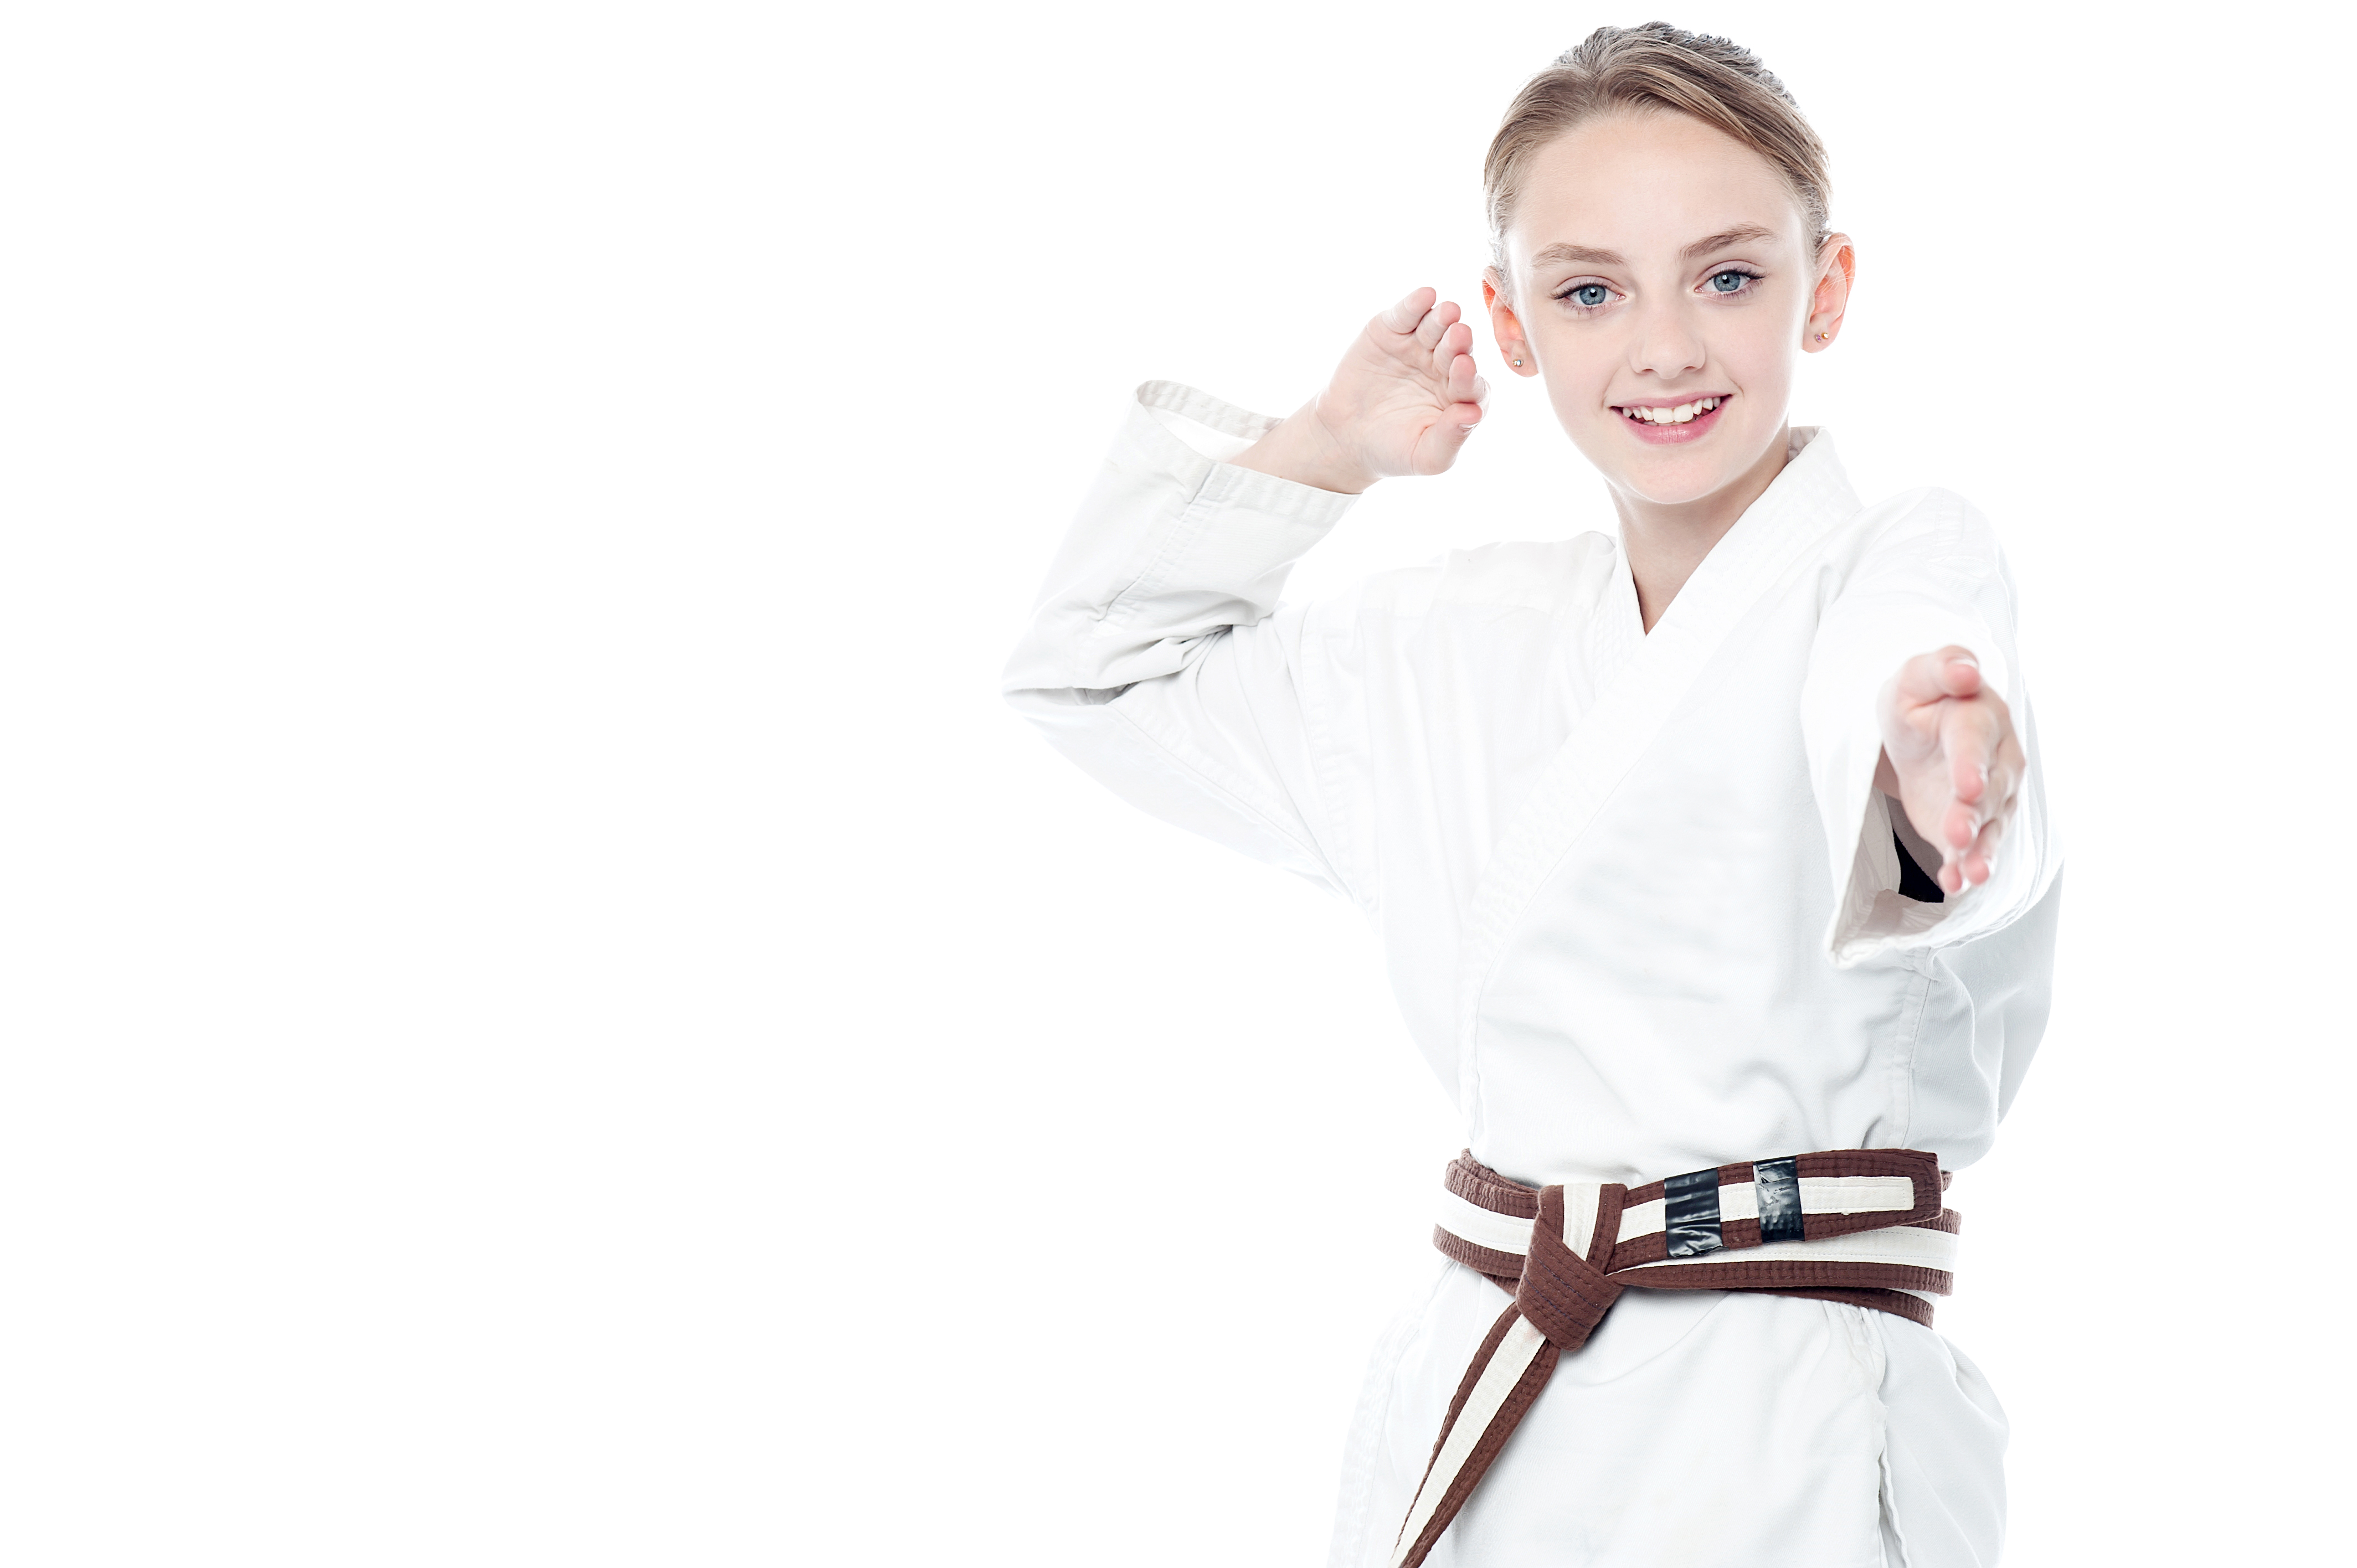 Girl png image purepng. Karate clipart individual sport